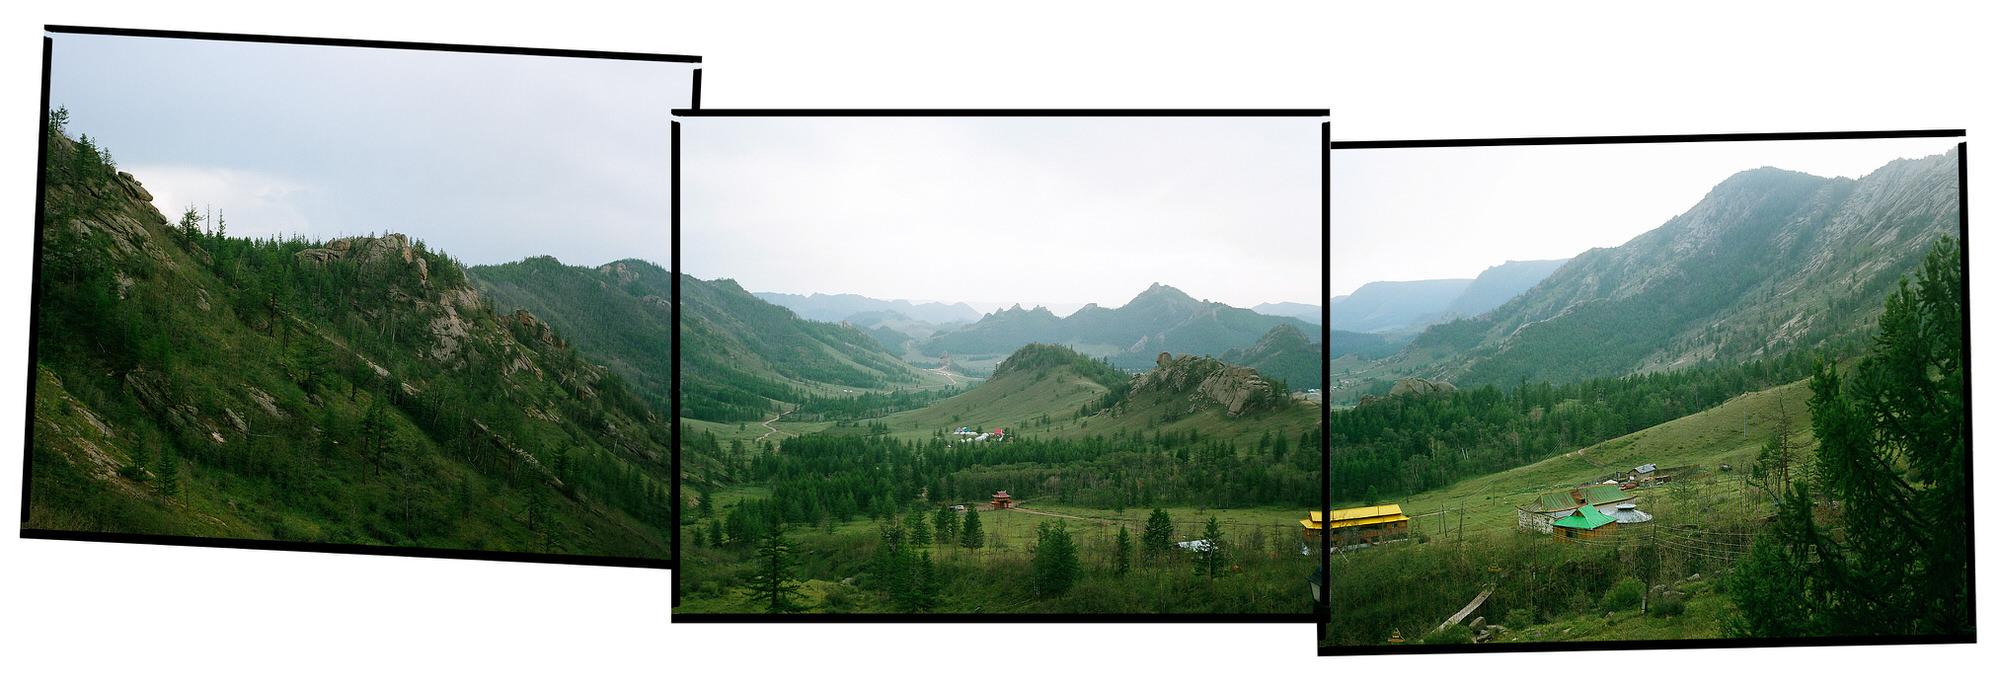 MediumFormatPatrikWallner_Mongolia_ViewMontageHIGHQ-1